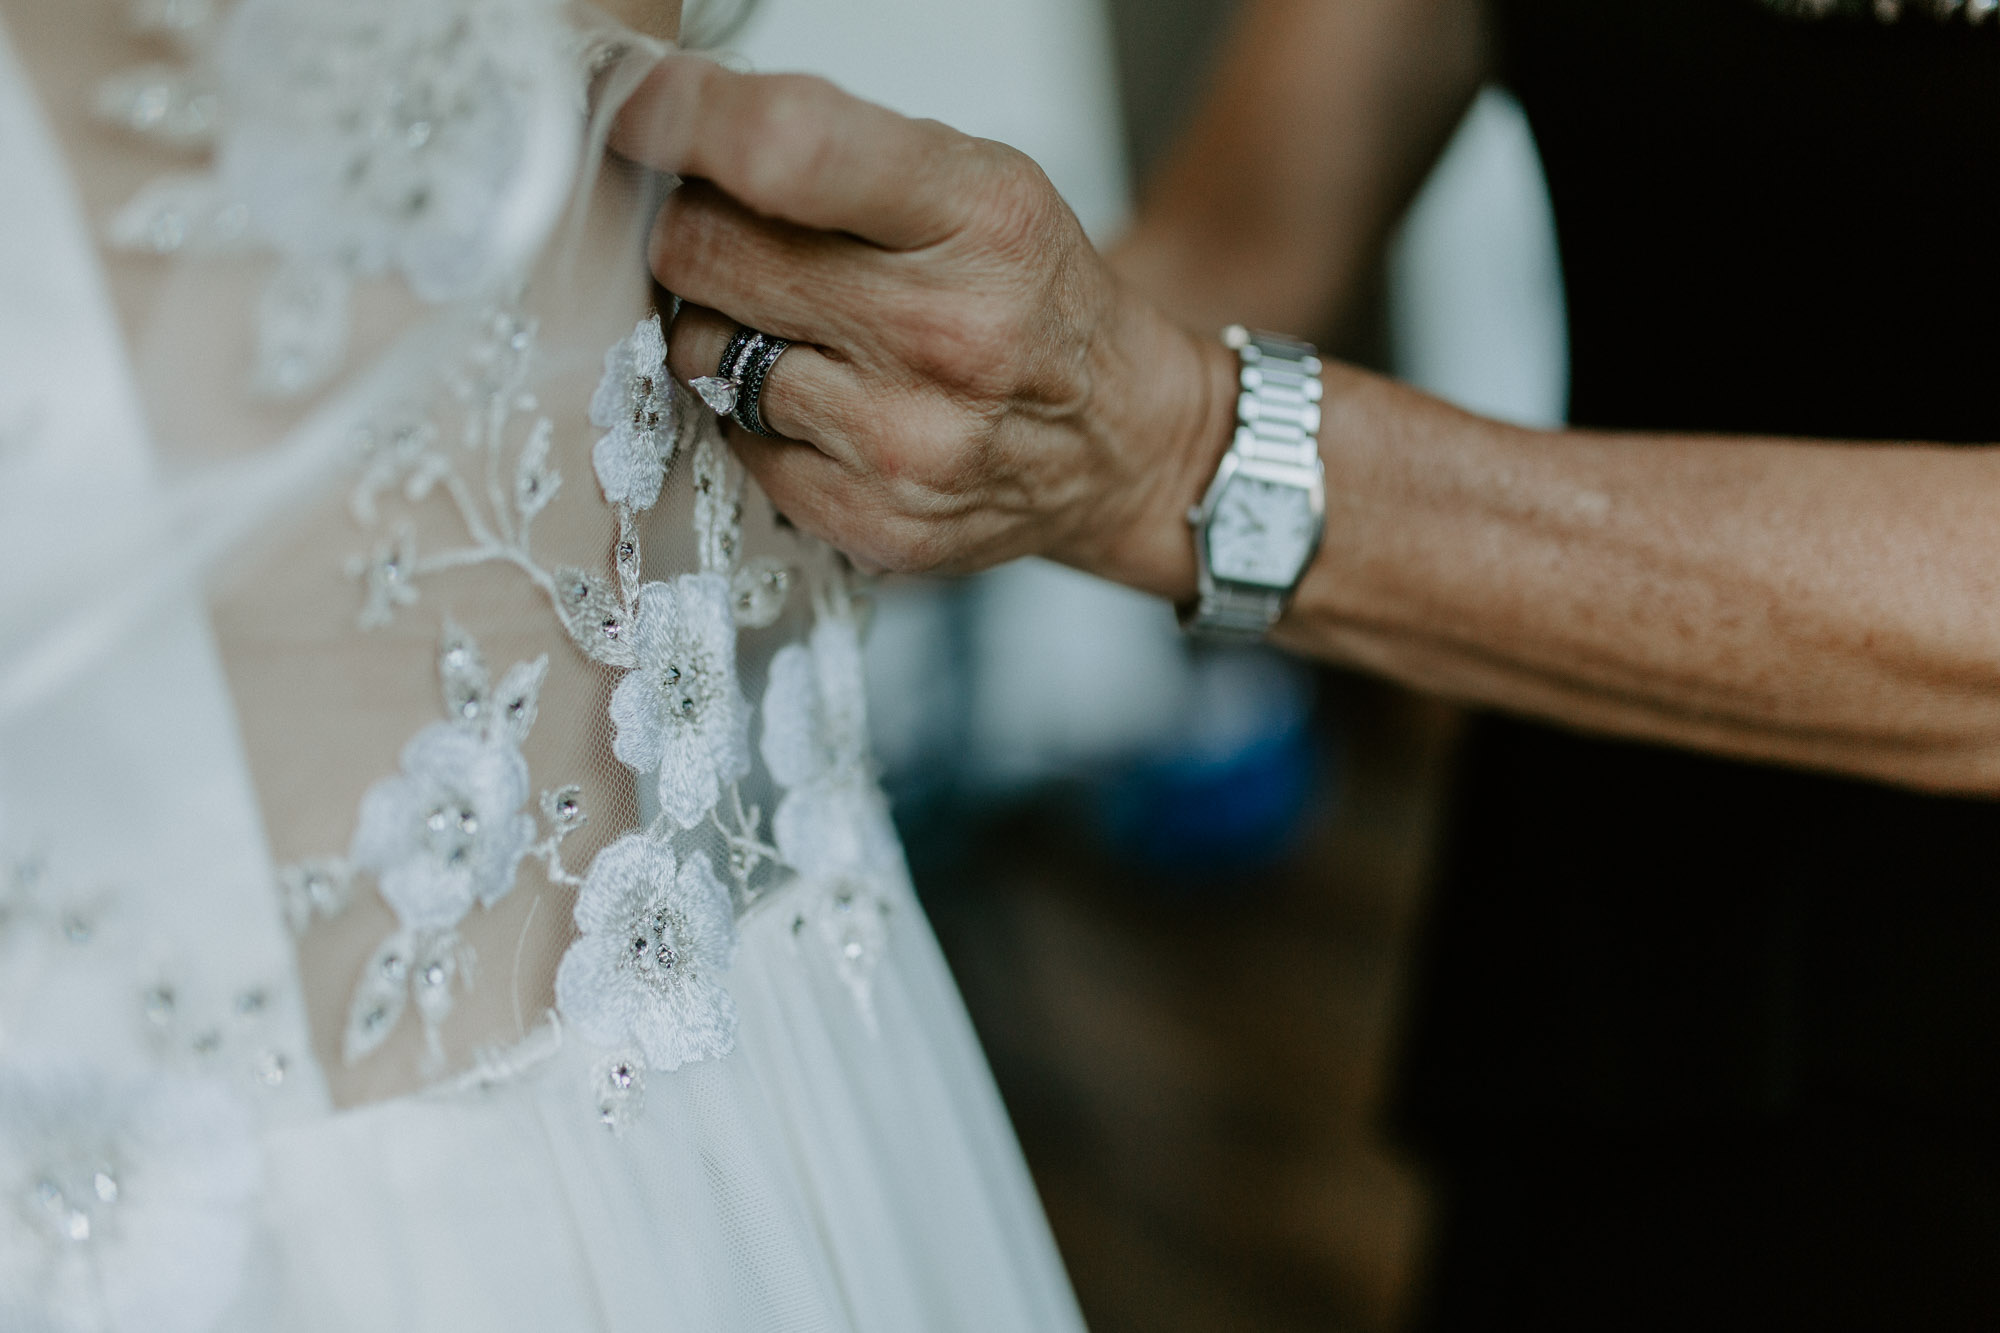 journeyman_distillery_wedding_photographer_chicago_il_wright_photographs-0909.jpg